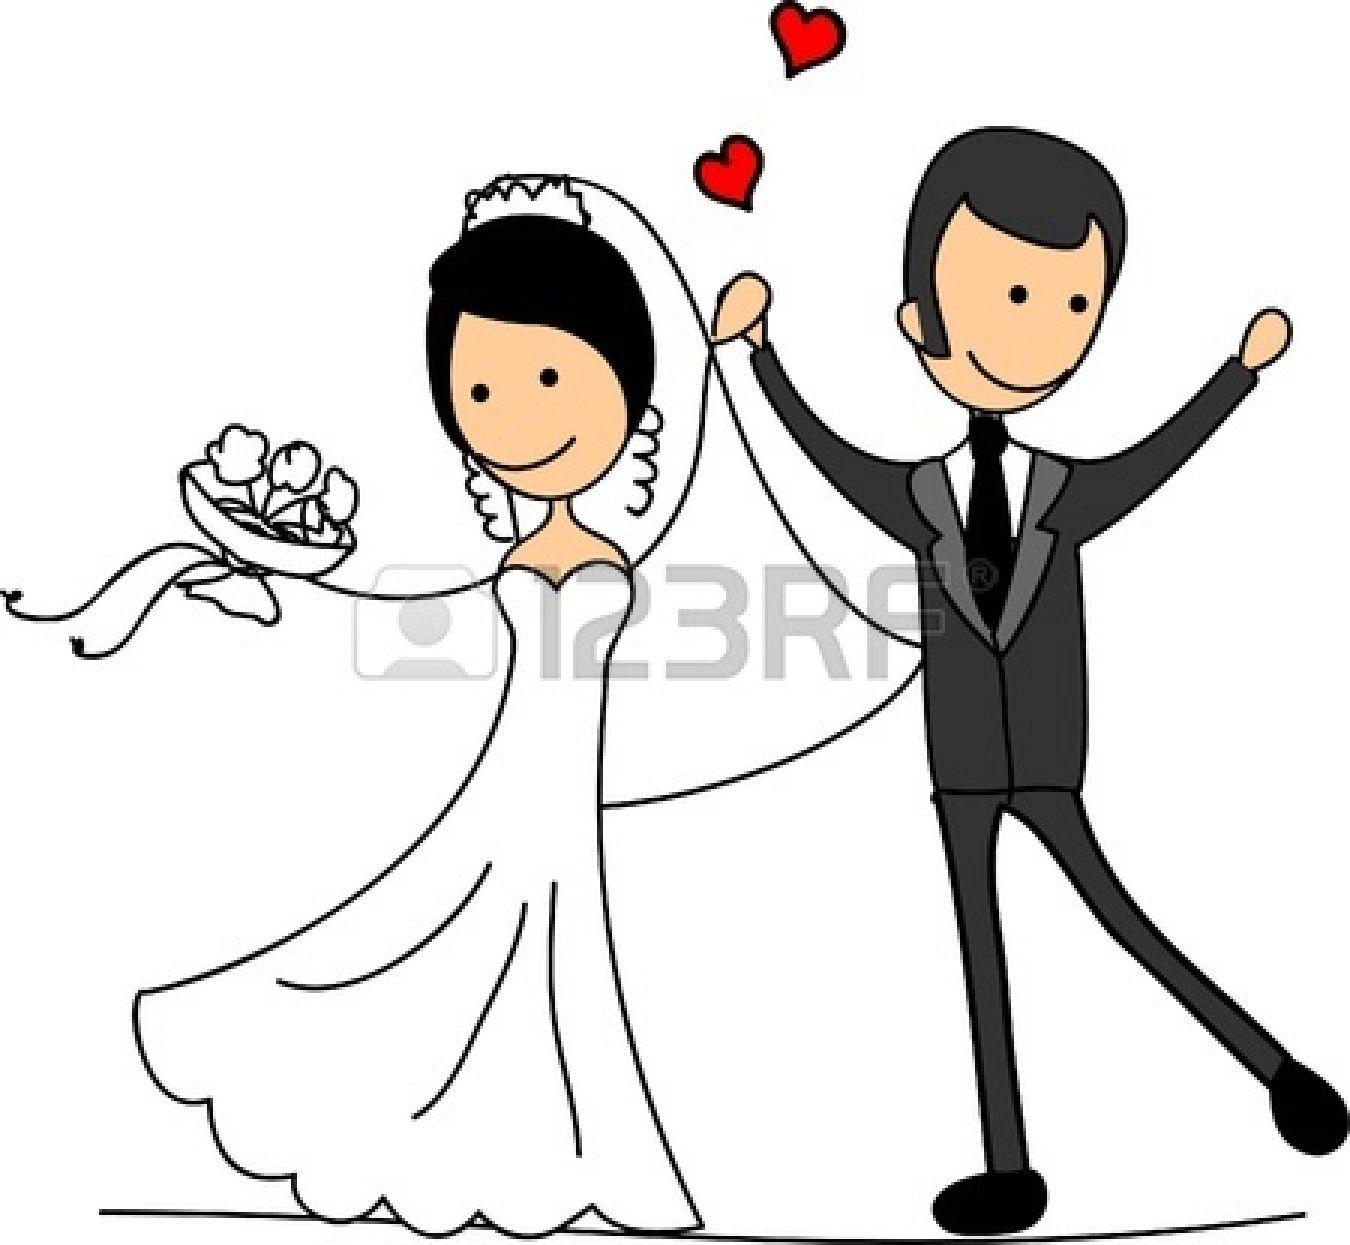 Bridal clipart cartoon. Download happy bride clif